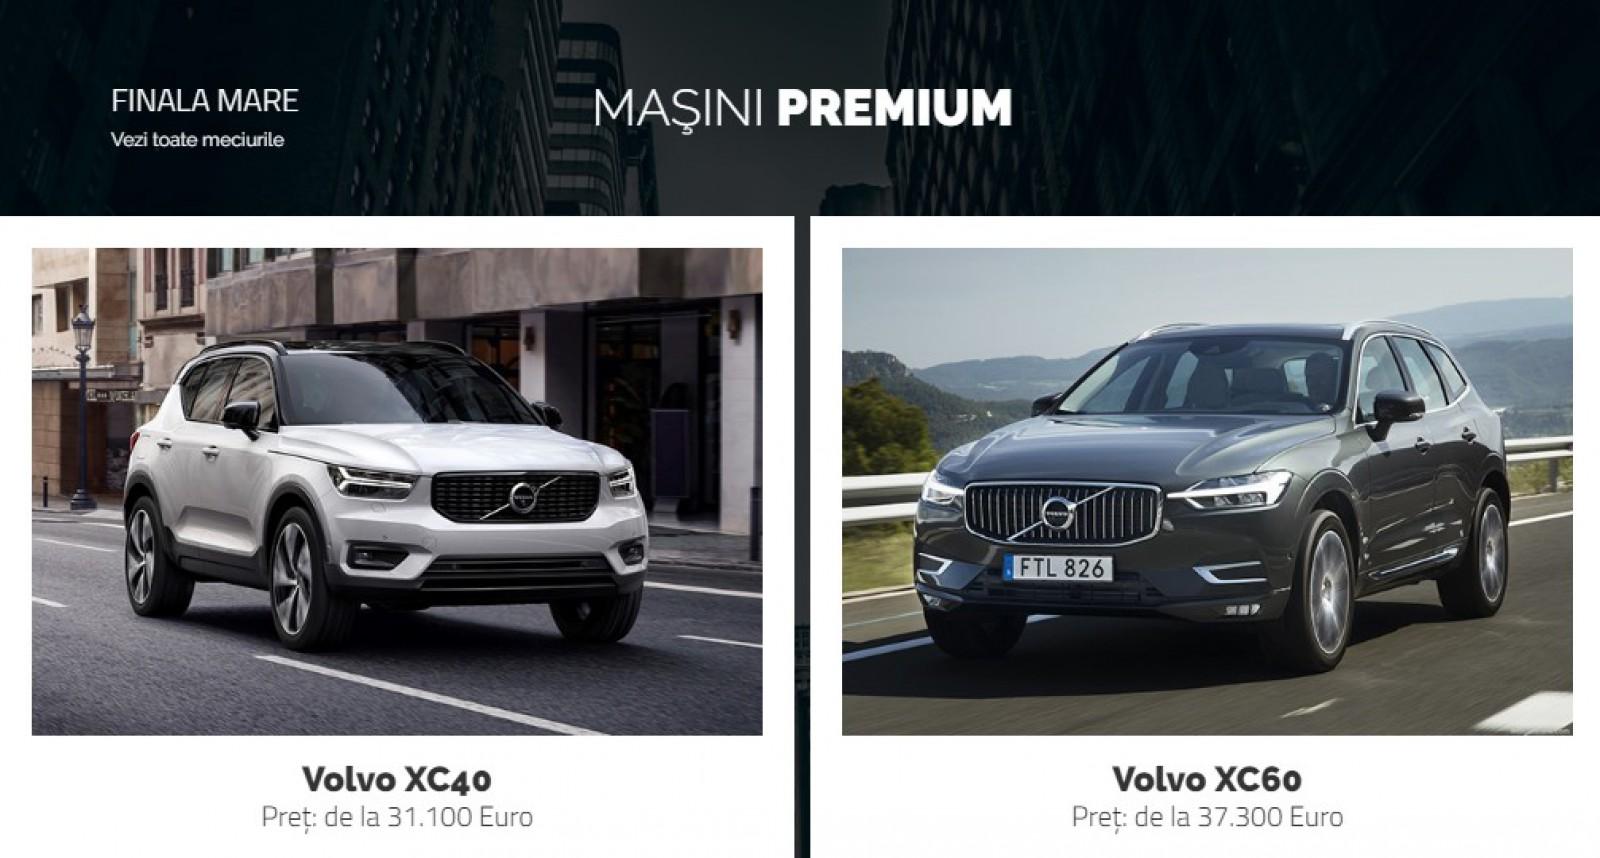 AUTOVOT MOLDOVA 2018! Marea finală din categoria Maşini Premium: Volvo XC40 vs Volvo XC60!